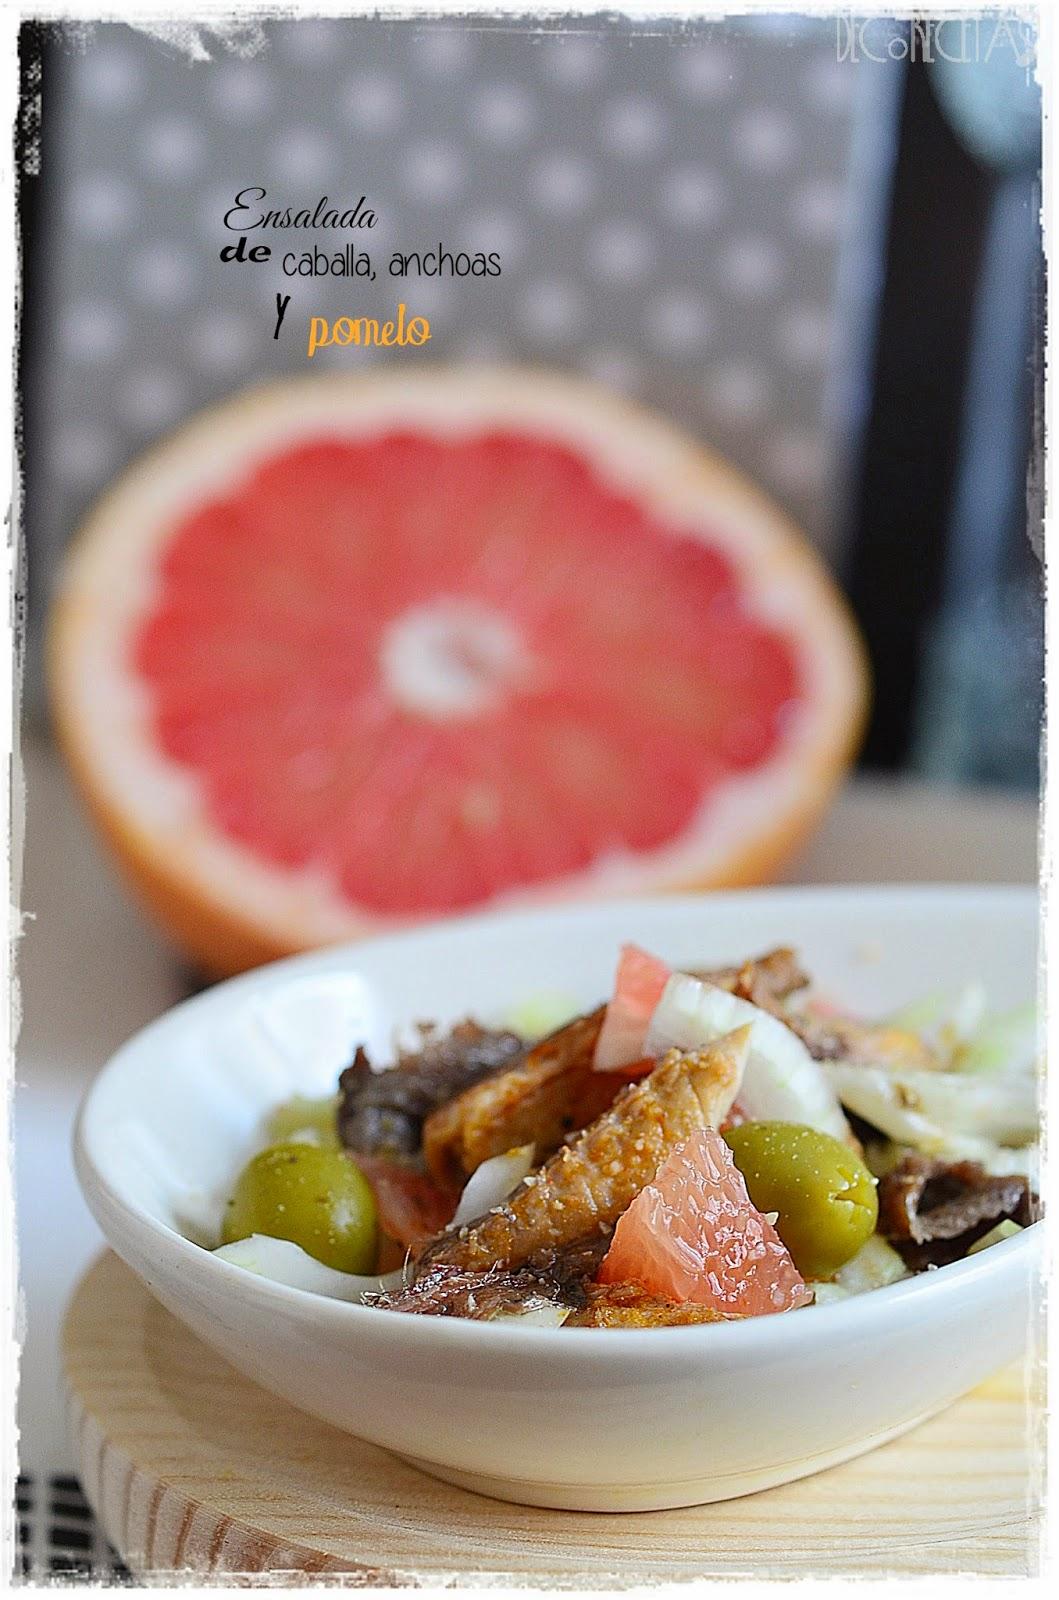 Ensalada de caballa, anchoa y pomelo